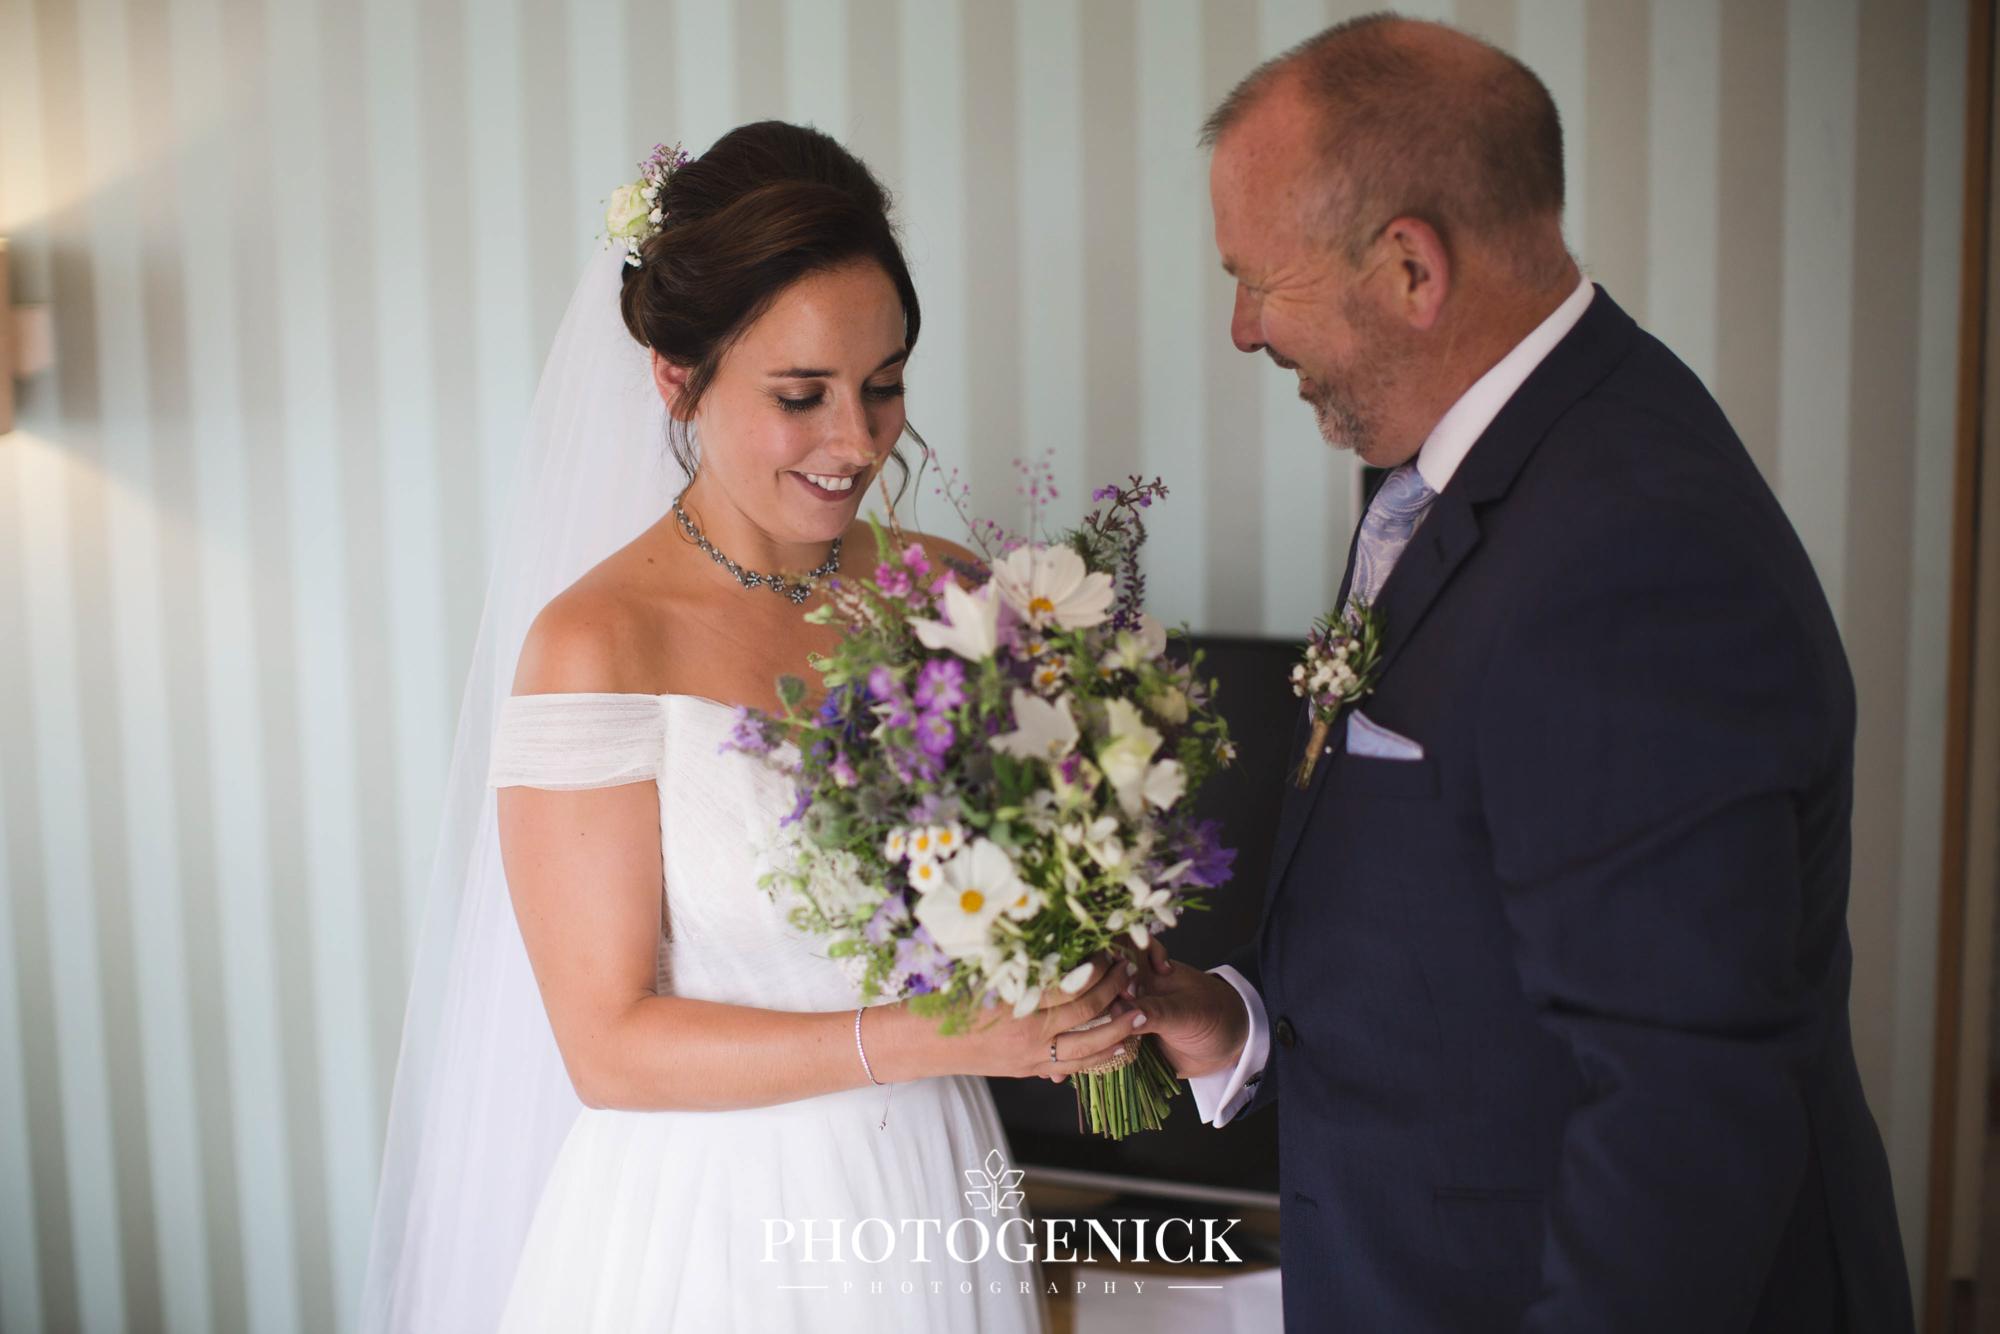 oldwalls gower wedding photographers-15.jpg